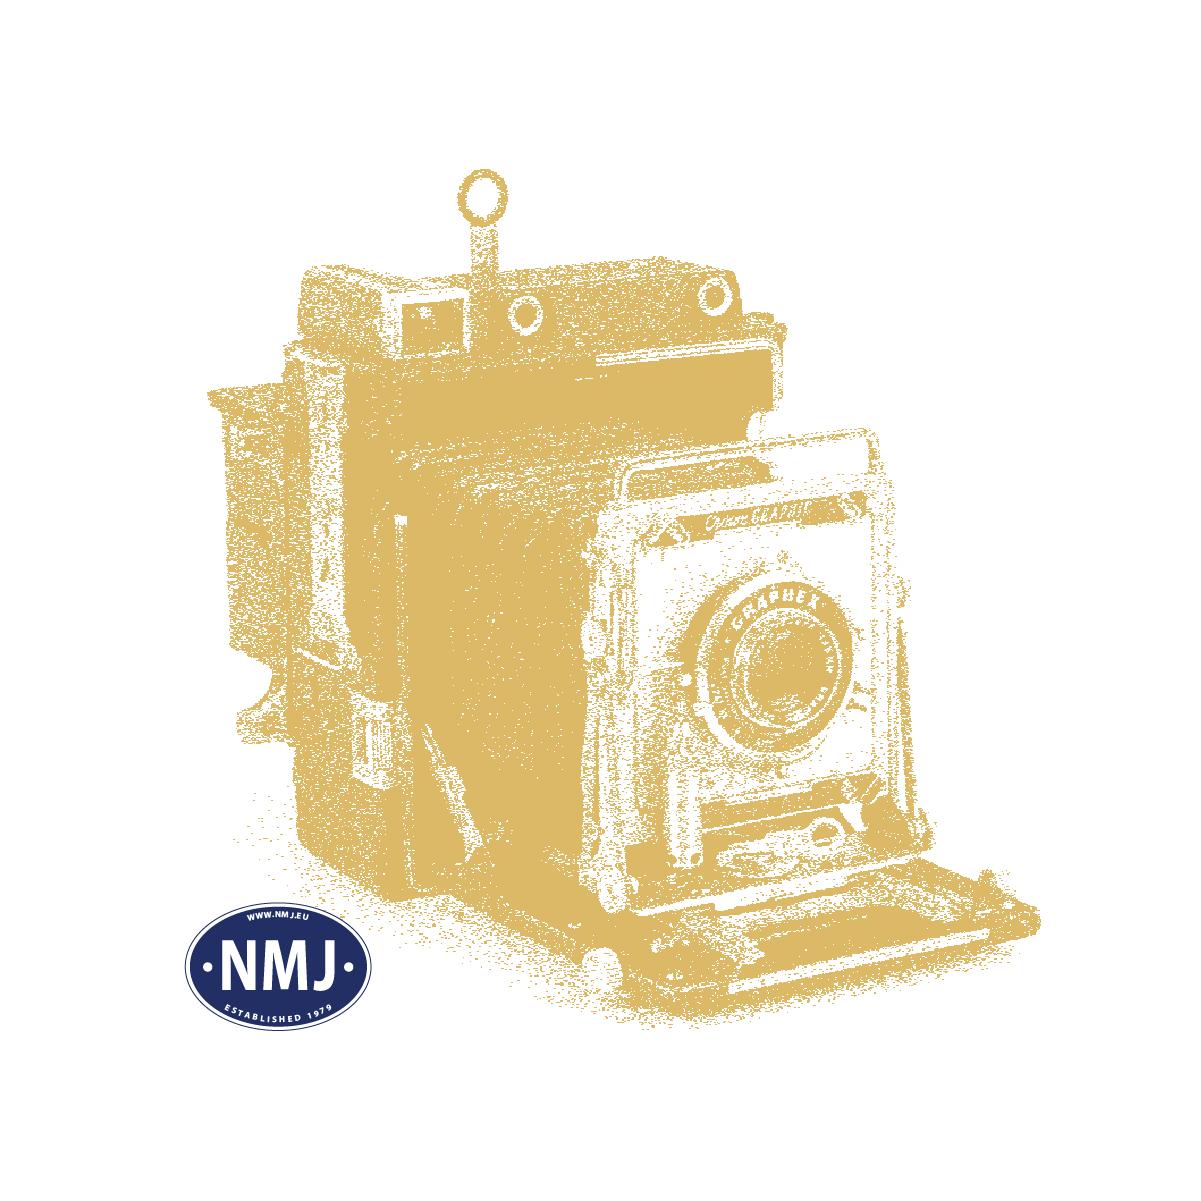 NMJT504.401 - NMJ Topline NSB His 210 2 625-1, type 4